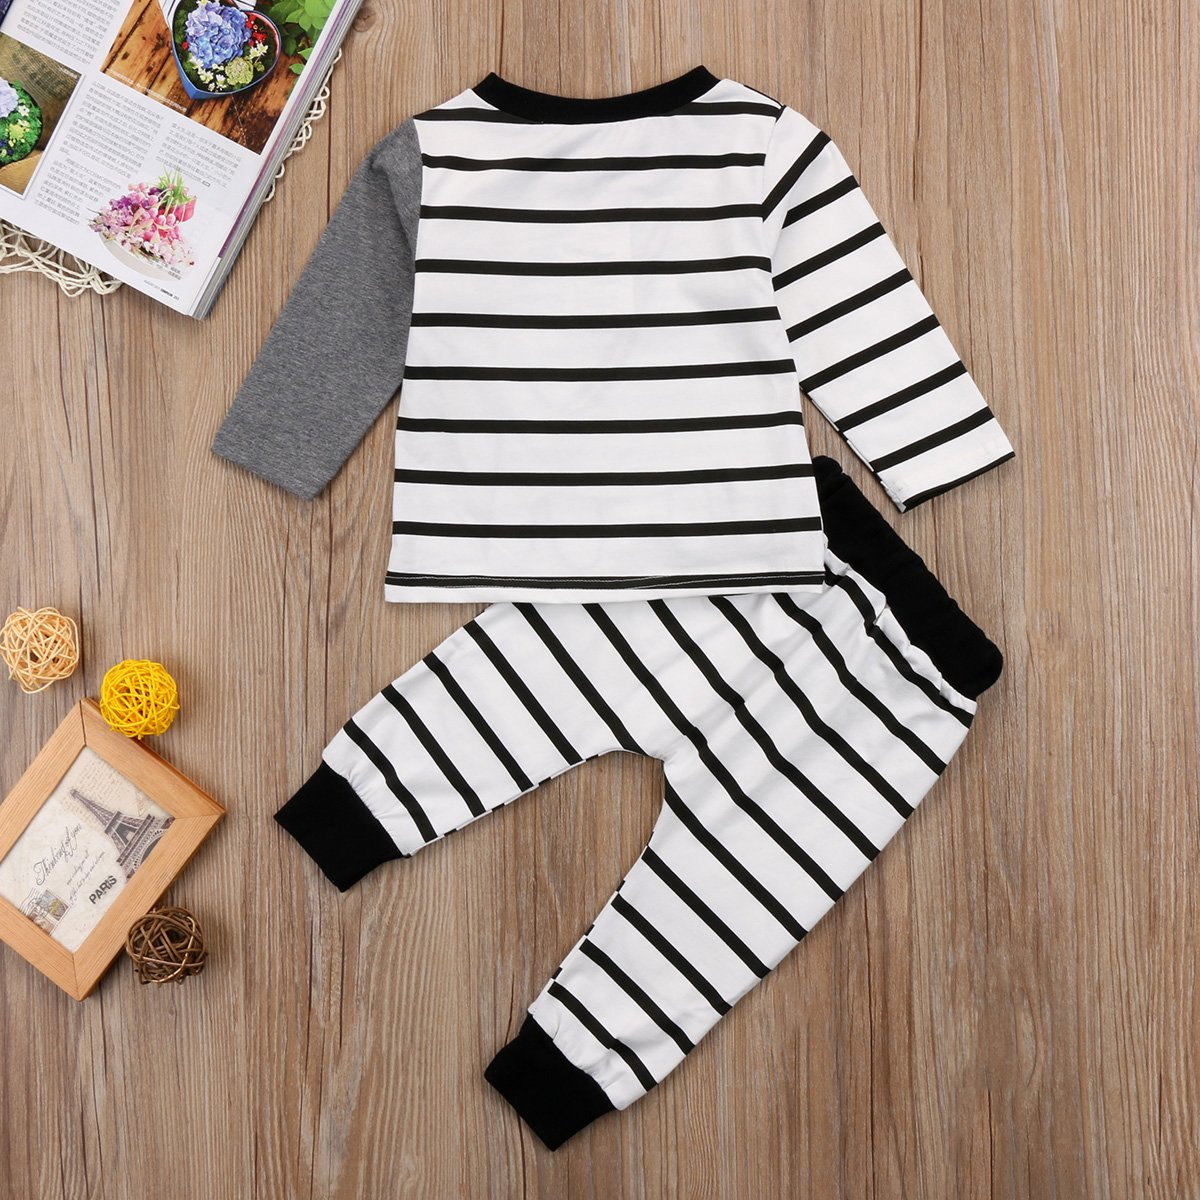 Xegendeiu Toddler Boy Girl Elephant Clothing Set Long Sleeve Print Sweater with Stripe Stretch Leggings Set 2 Piece Outfit